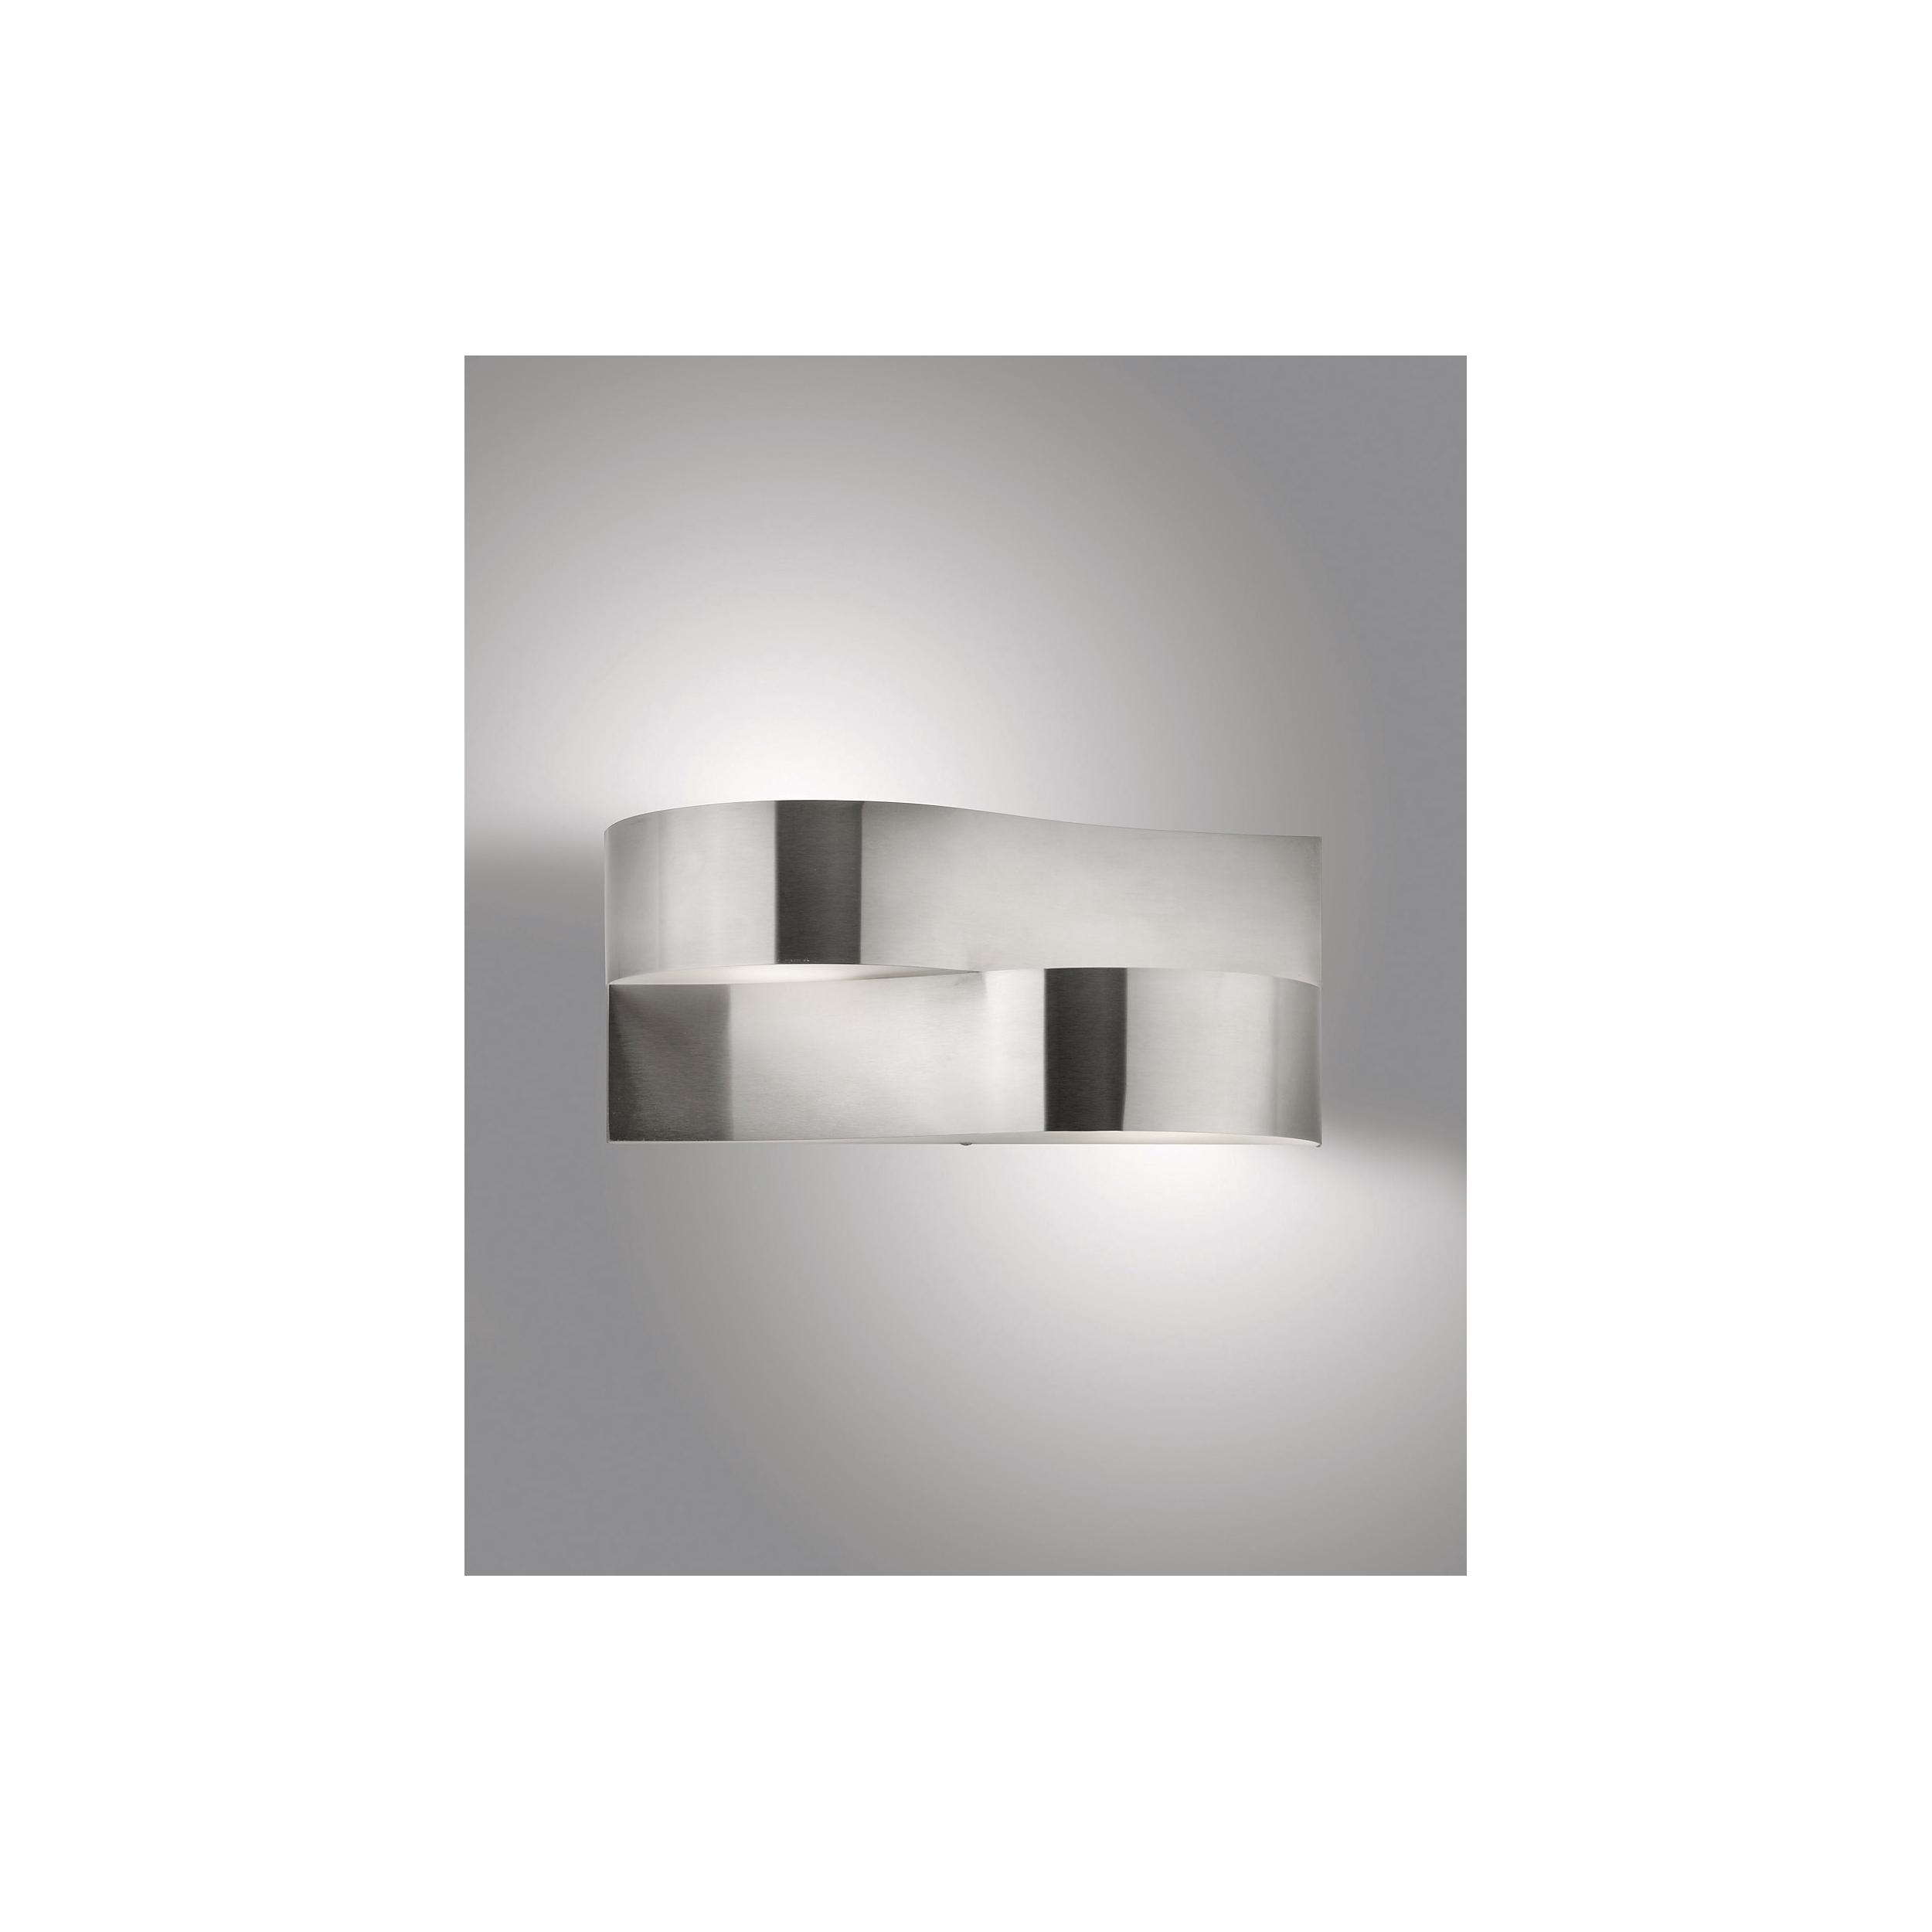 Philips Ecomoods Wall Lights : Philips Ecomoods Outdoor Wall Light Fluorescent Garden Patio Energy Saving Lamp eBay